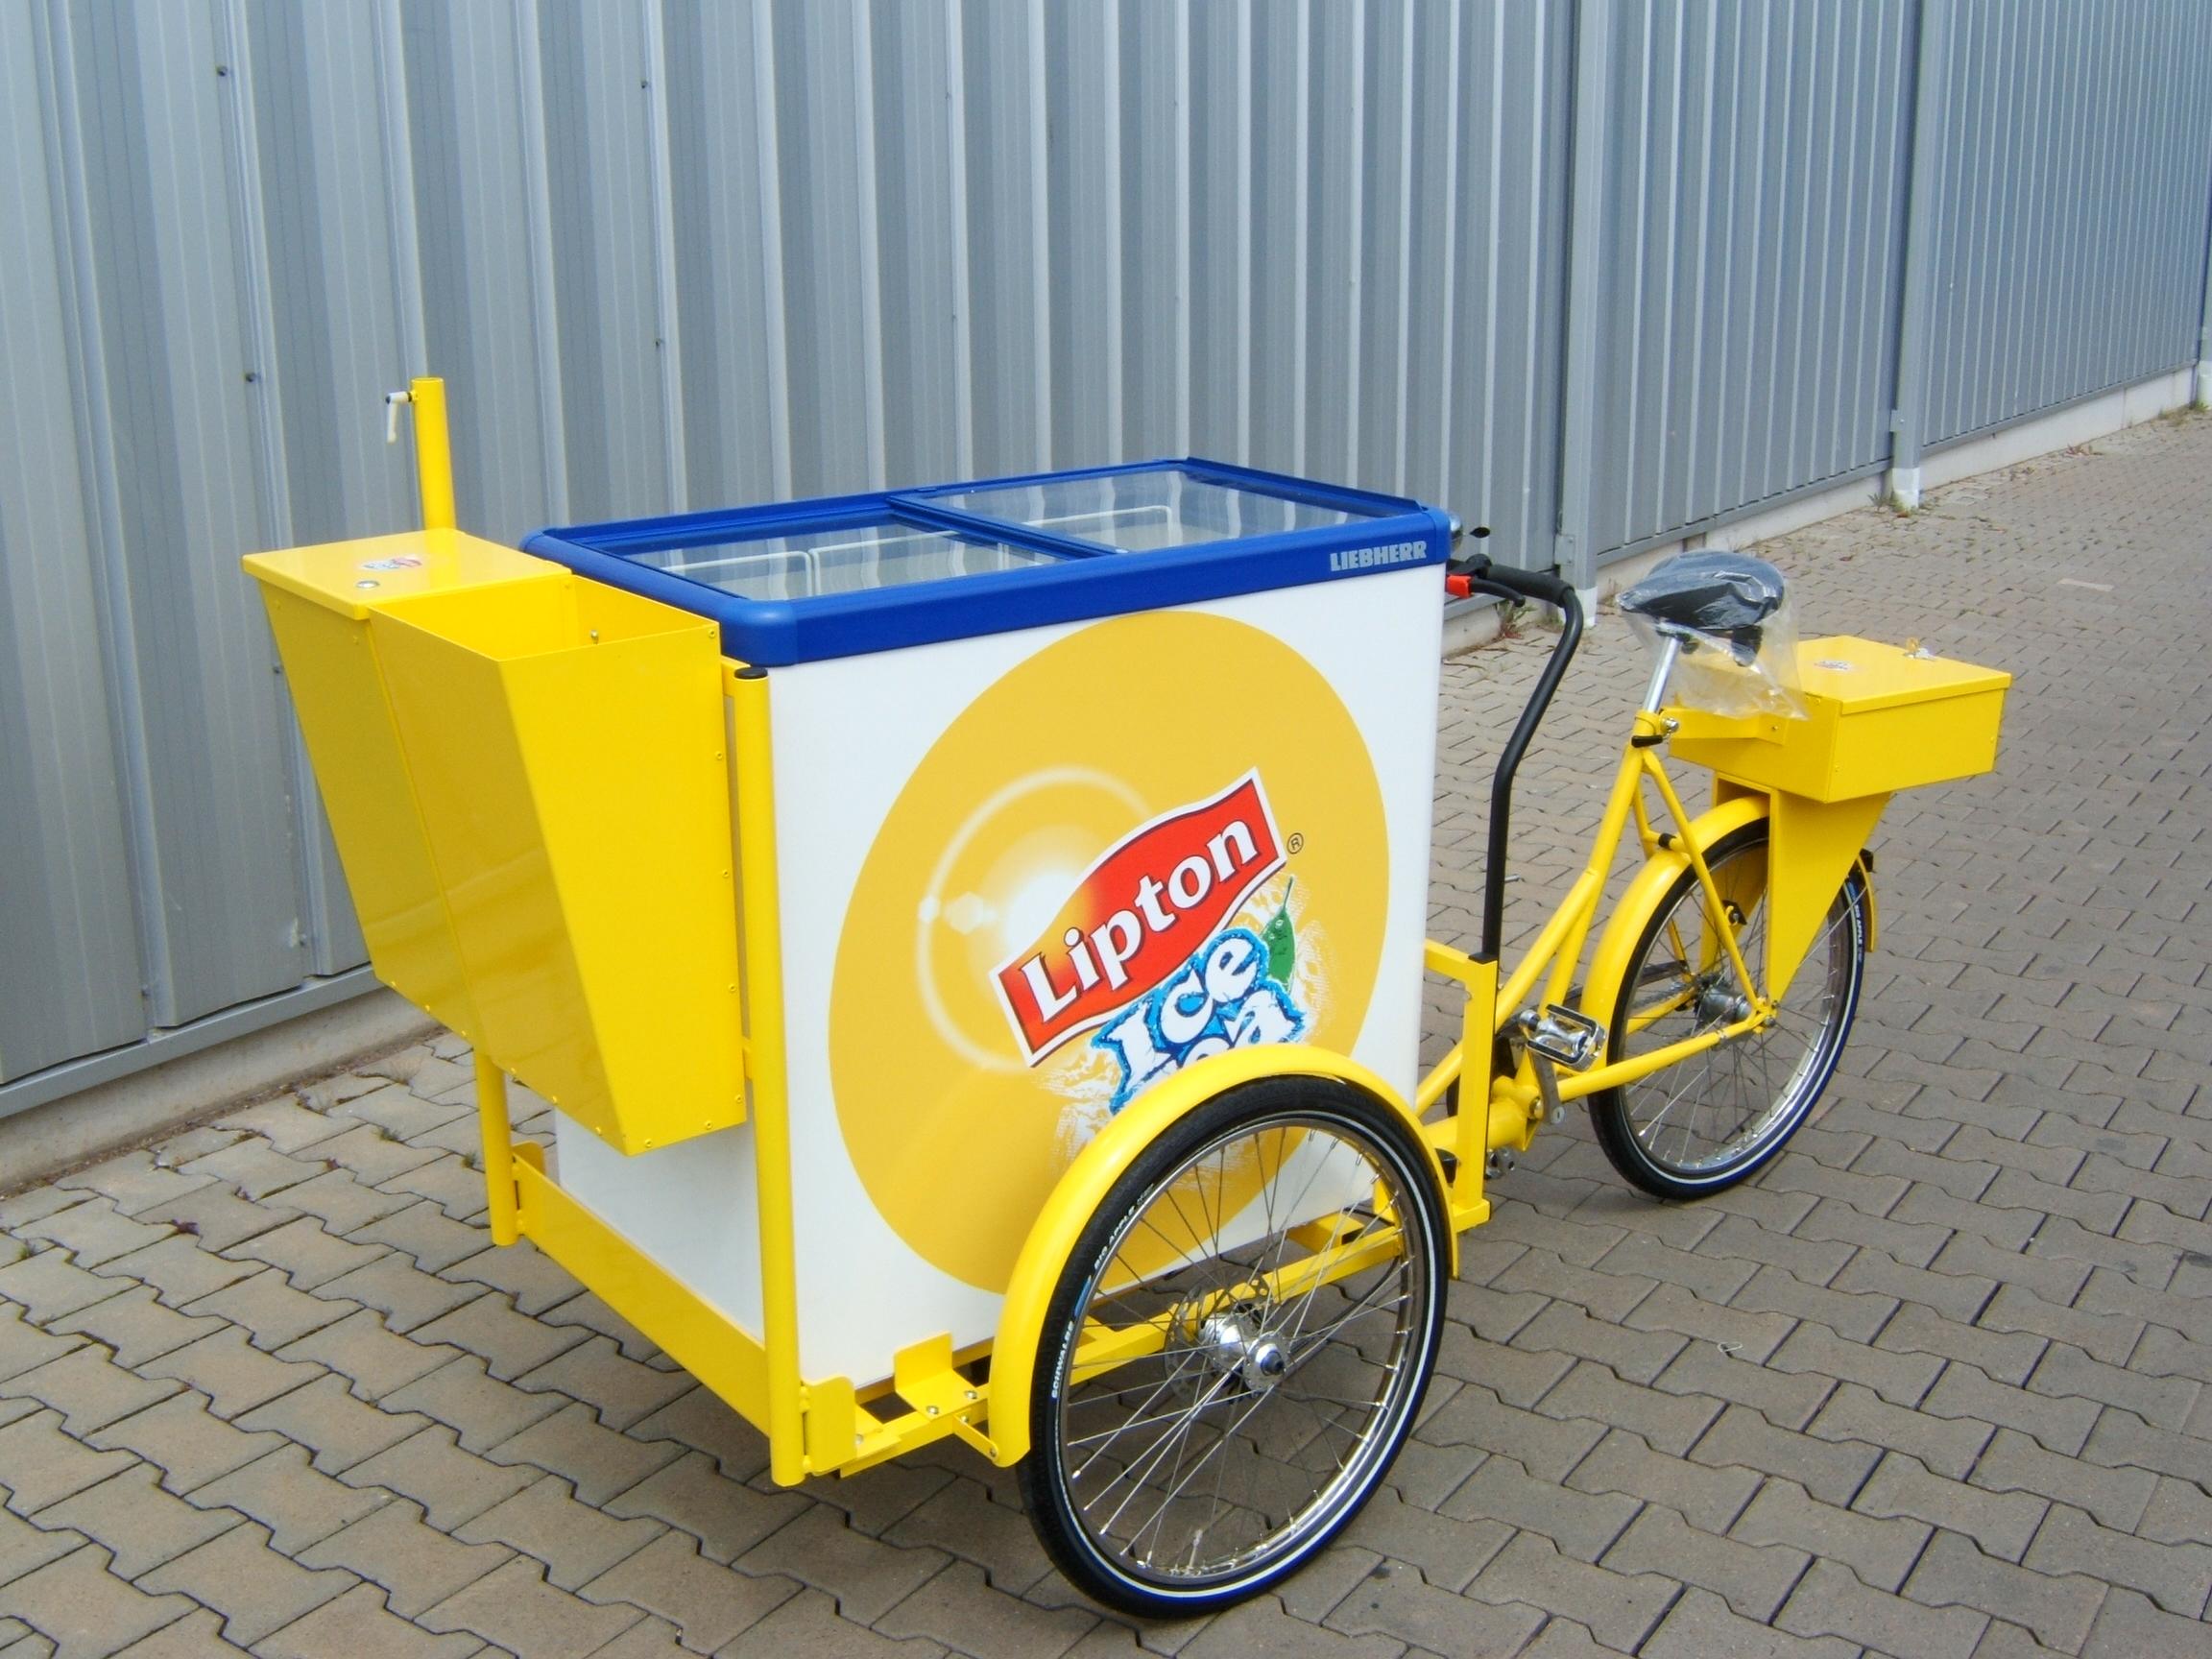 Verkaufsrad Verkaufsfahrrad Gastrobike grillfahrrad, Verkaufsfahrrad, crepesfahrrad, grillbike, foodbike, food-bike.